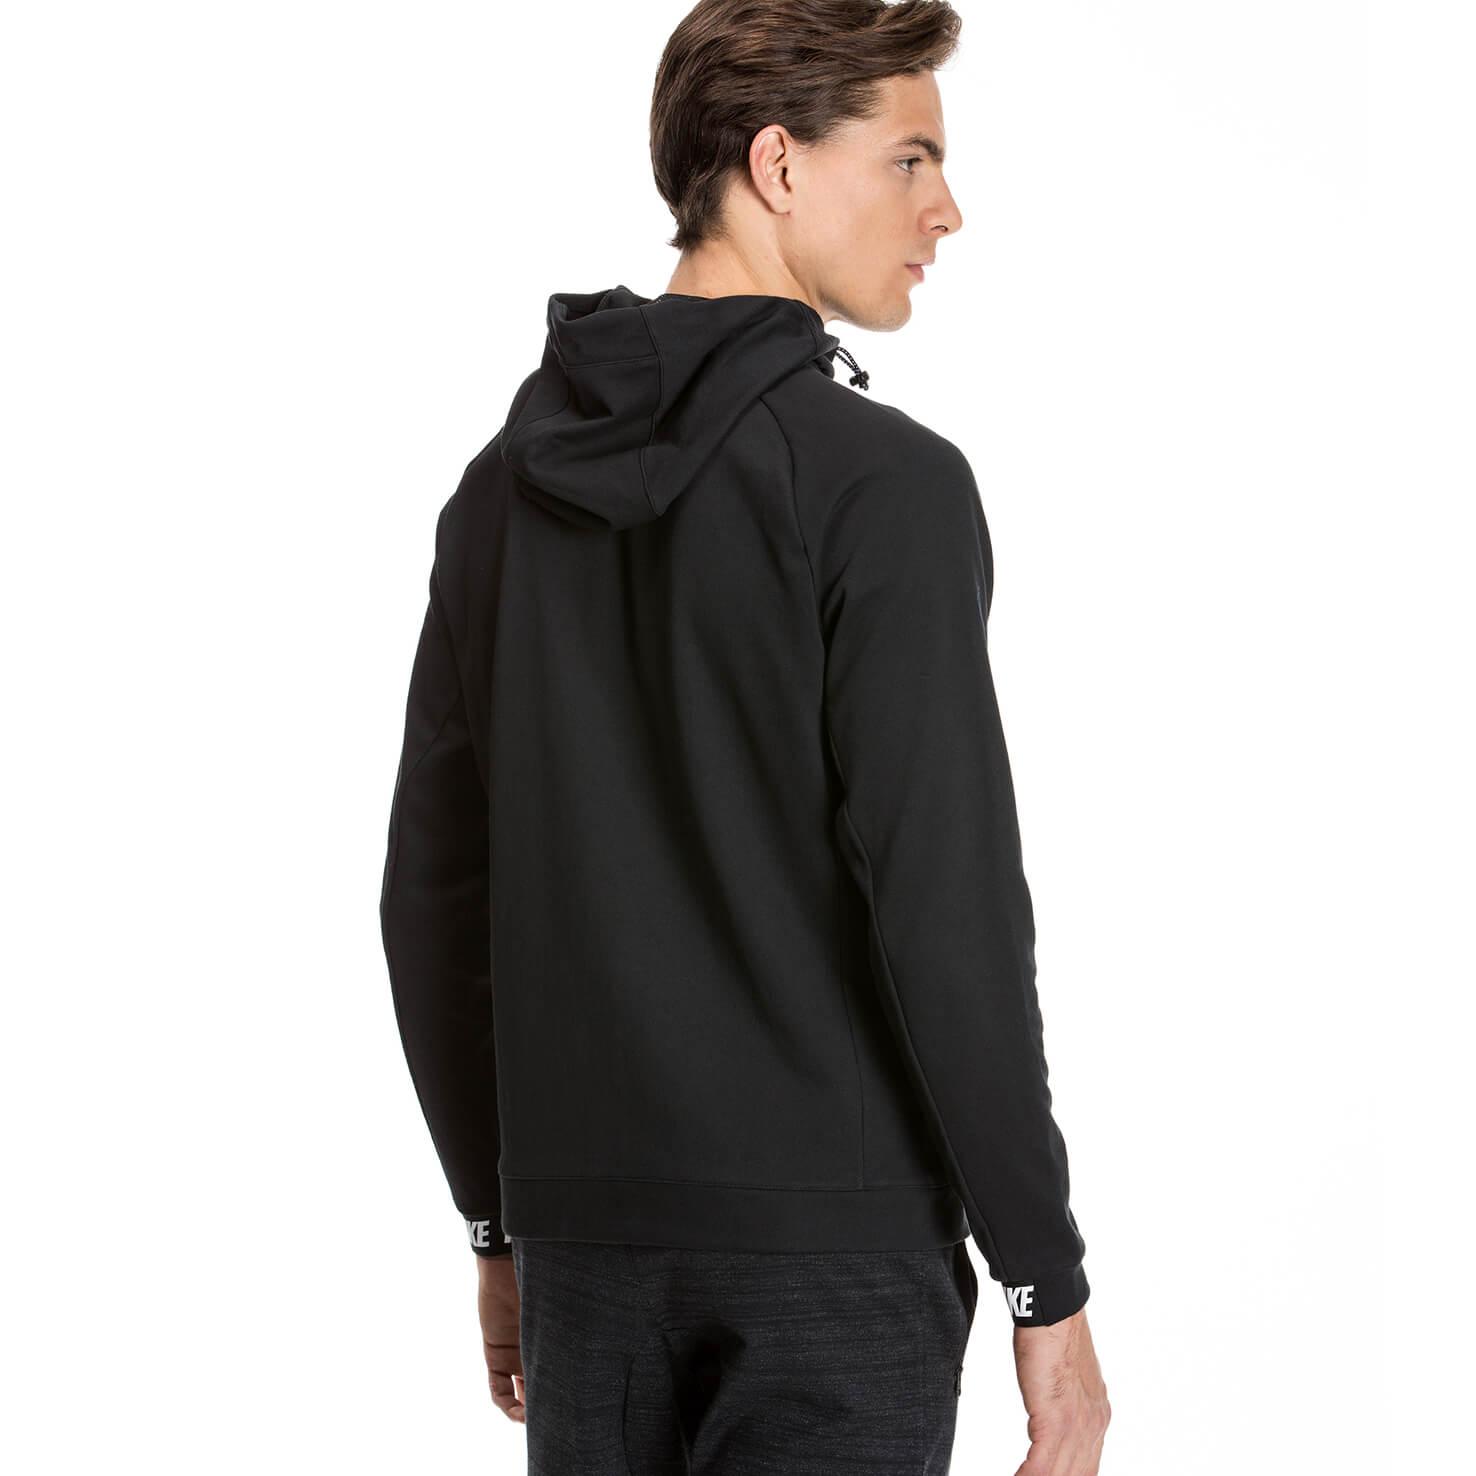 Nike Av15 Hoodie Fz Flc Erkek Siyah Sweatshirt